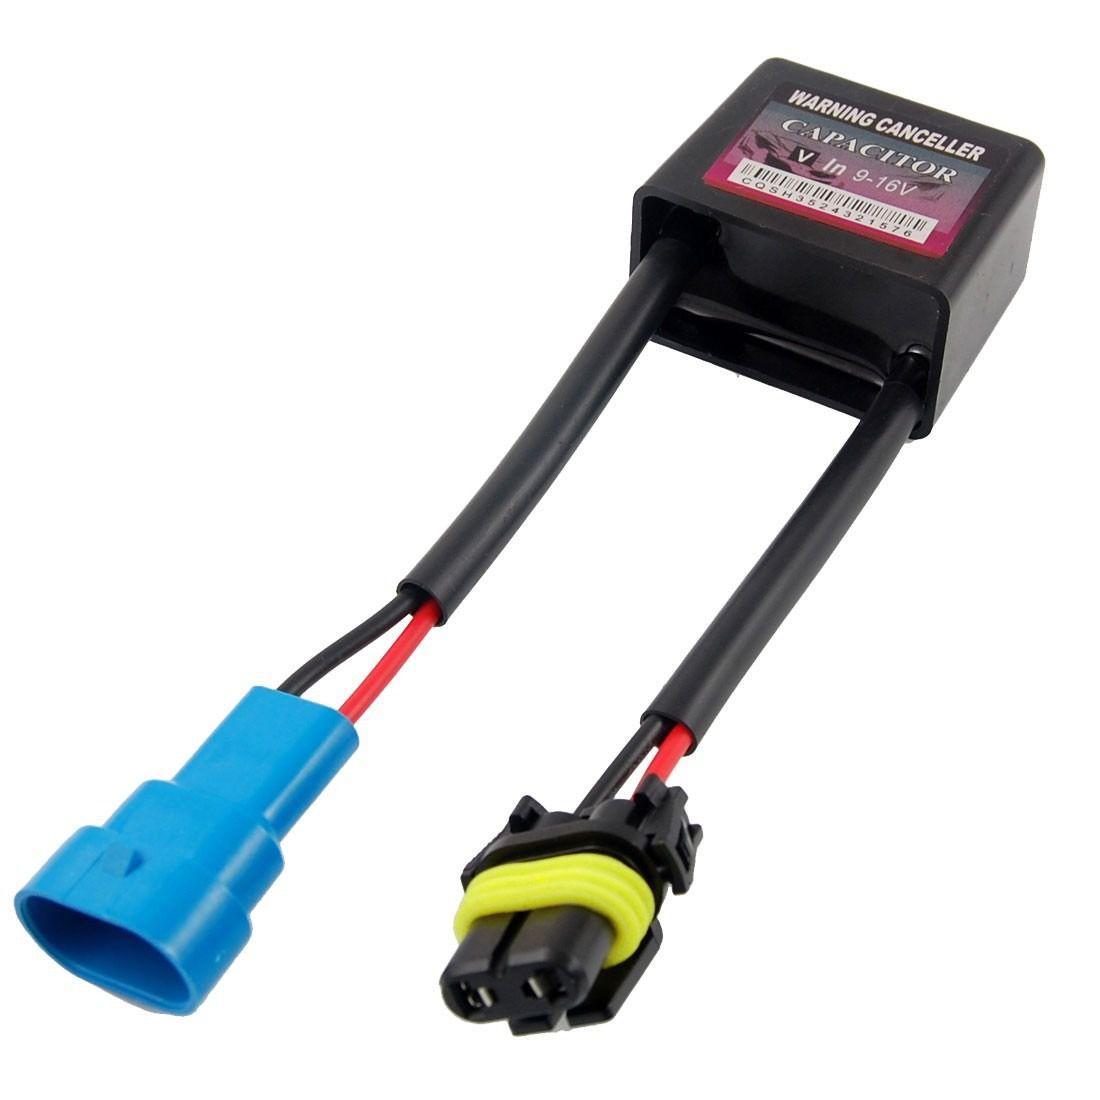 1 Canceller Para Bi E Xenon -v In9 H1 H3 H4 H7 H11 Hb3 Hb4